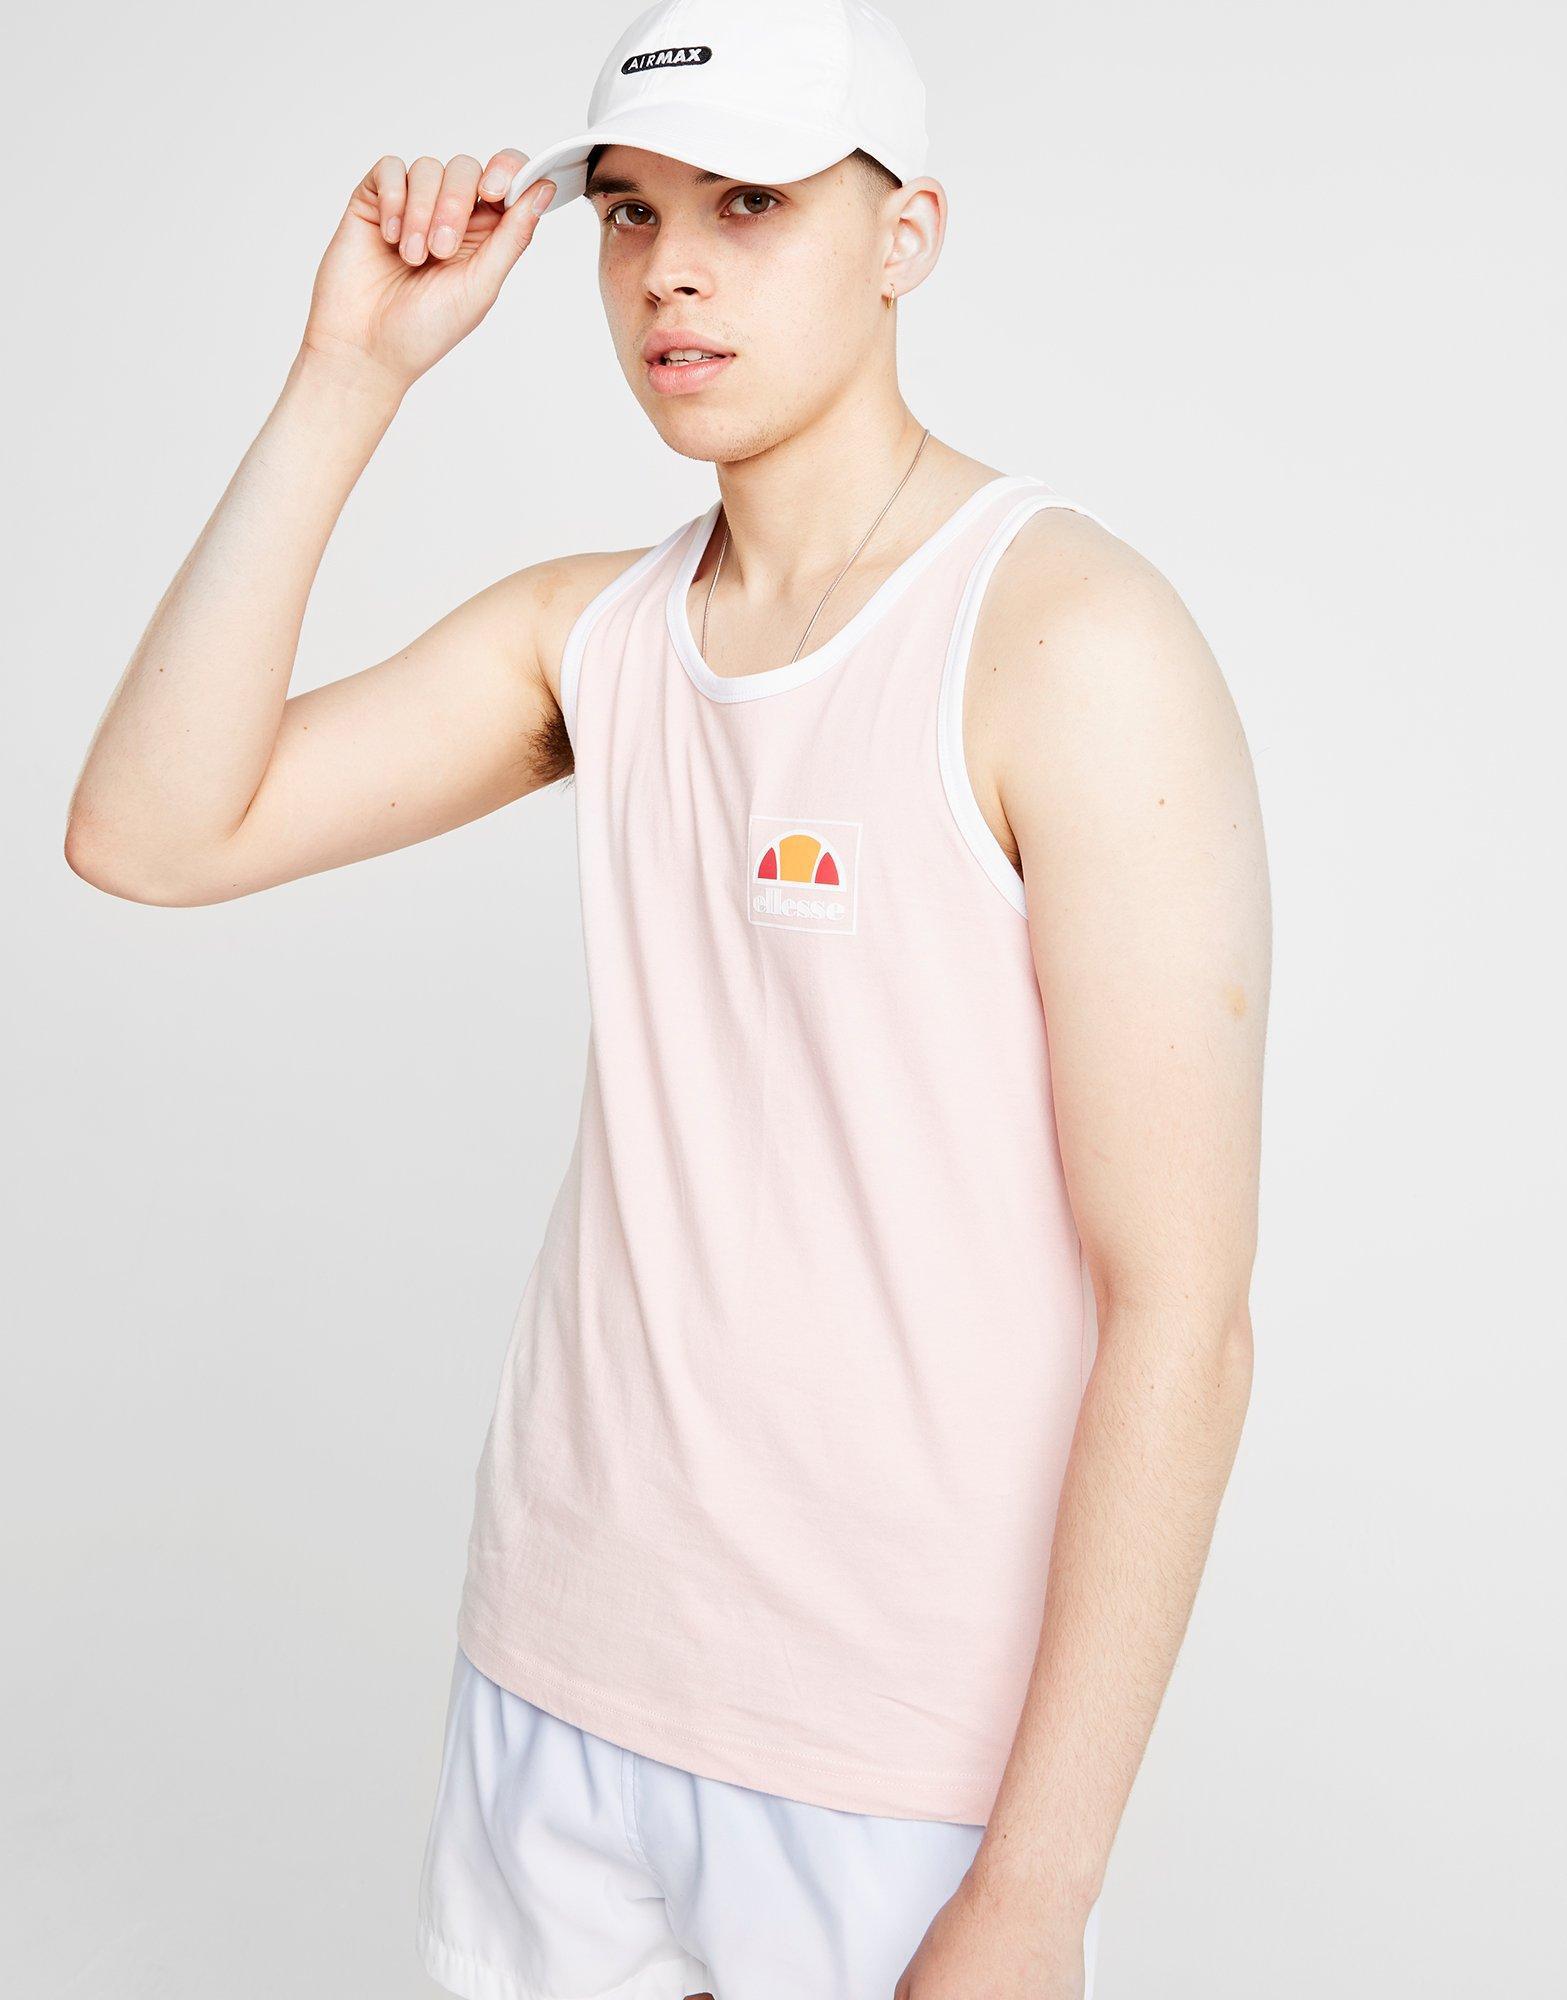 80e9a94aa20 Ellesse Vanzio Vest in Pink for Men - Lyst